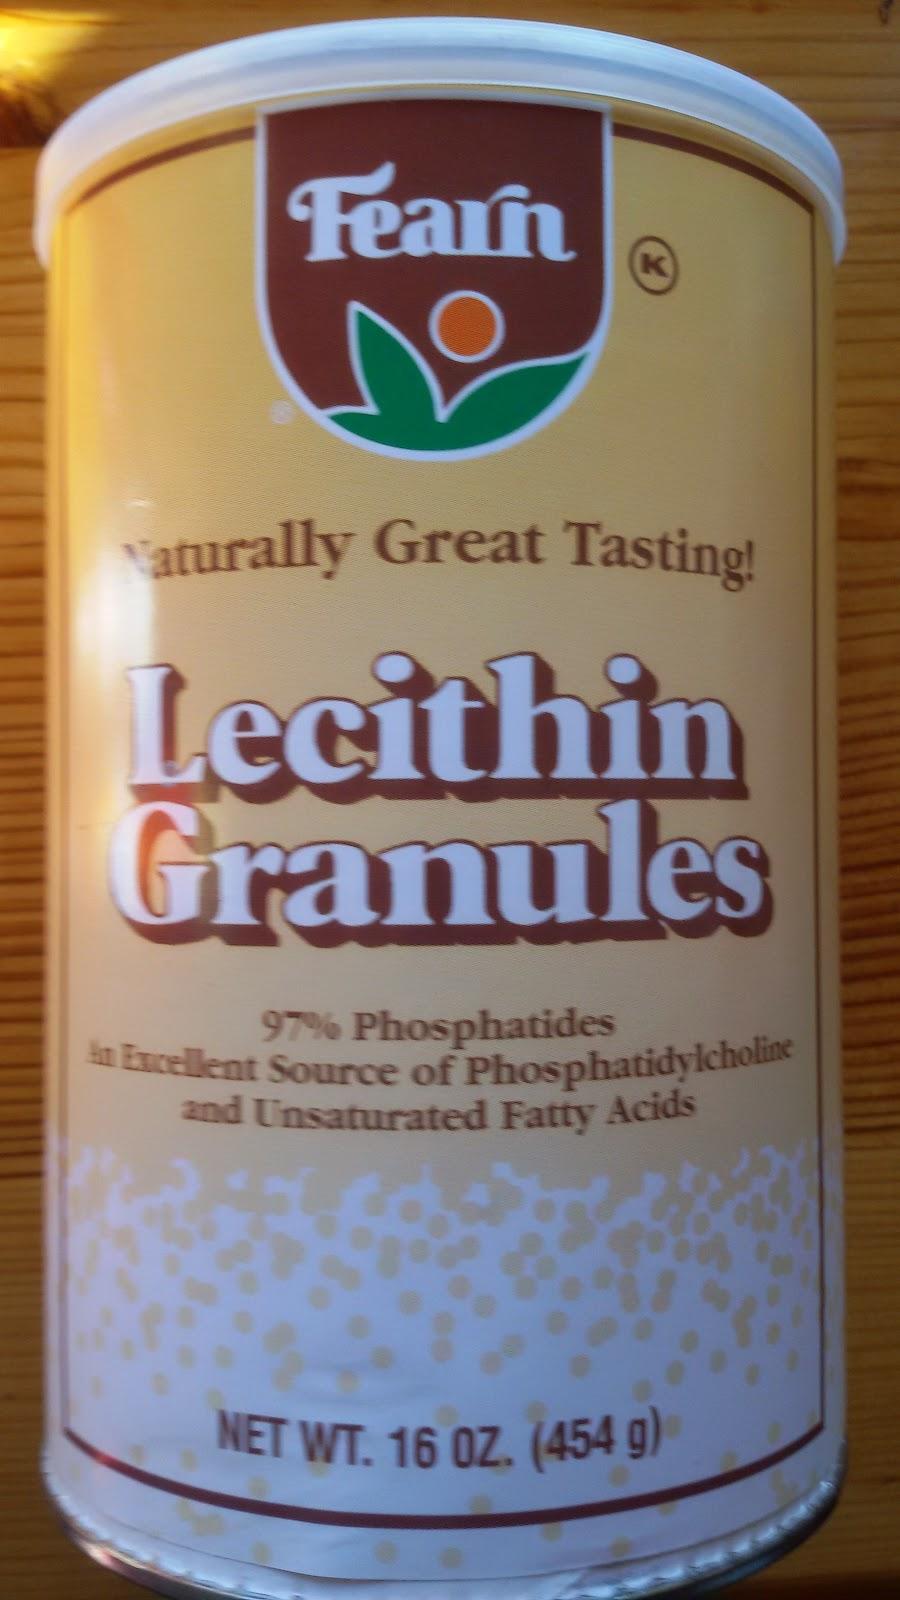 Fearn Lecithin Granules